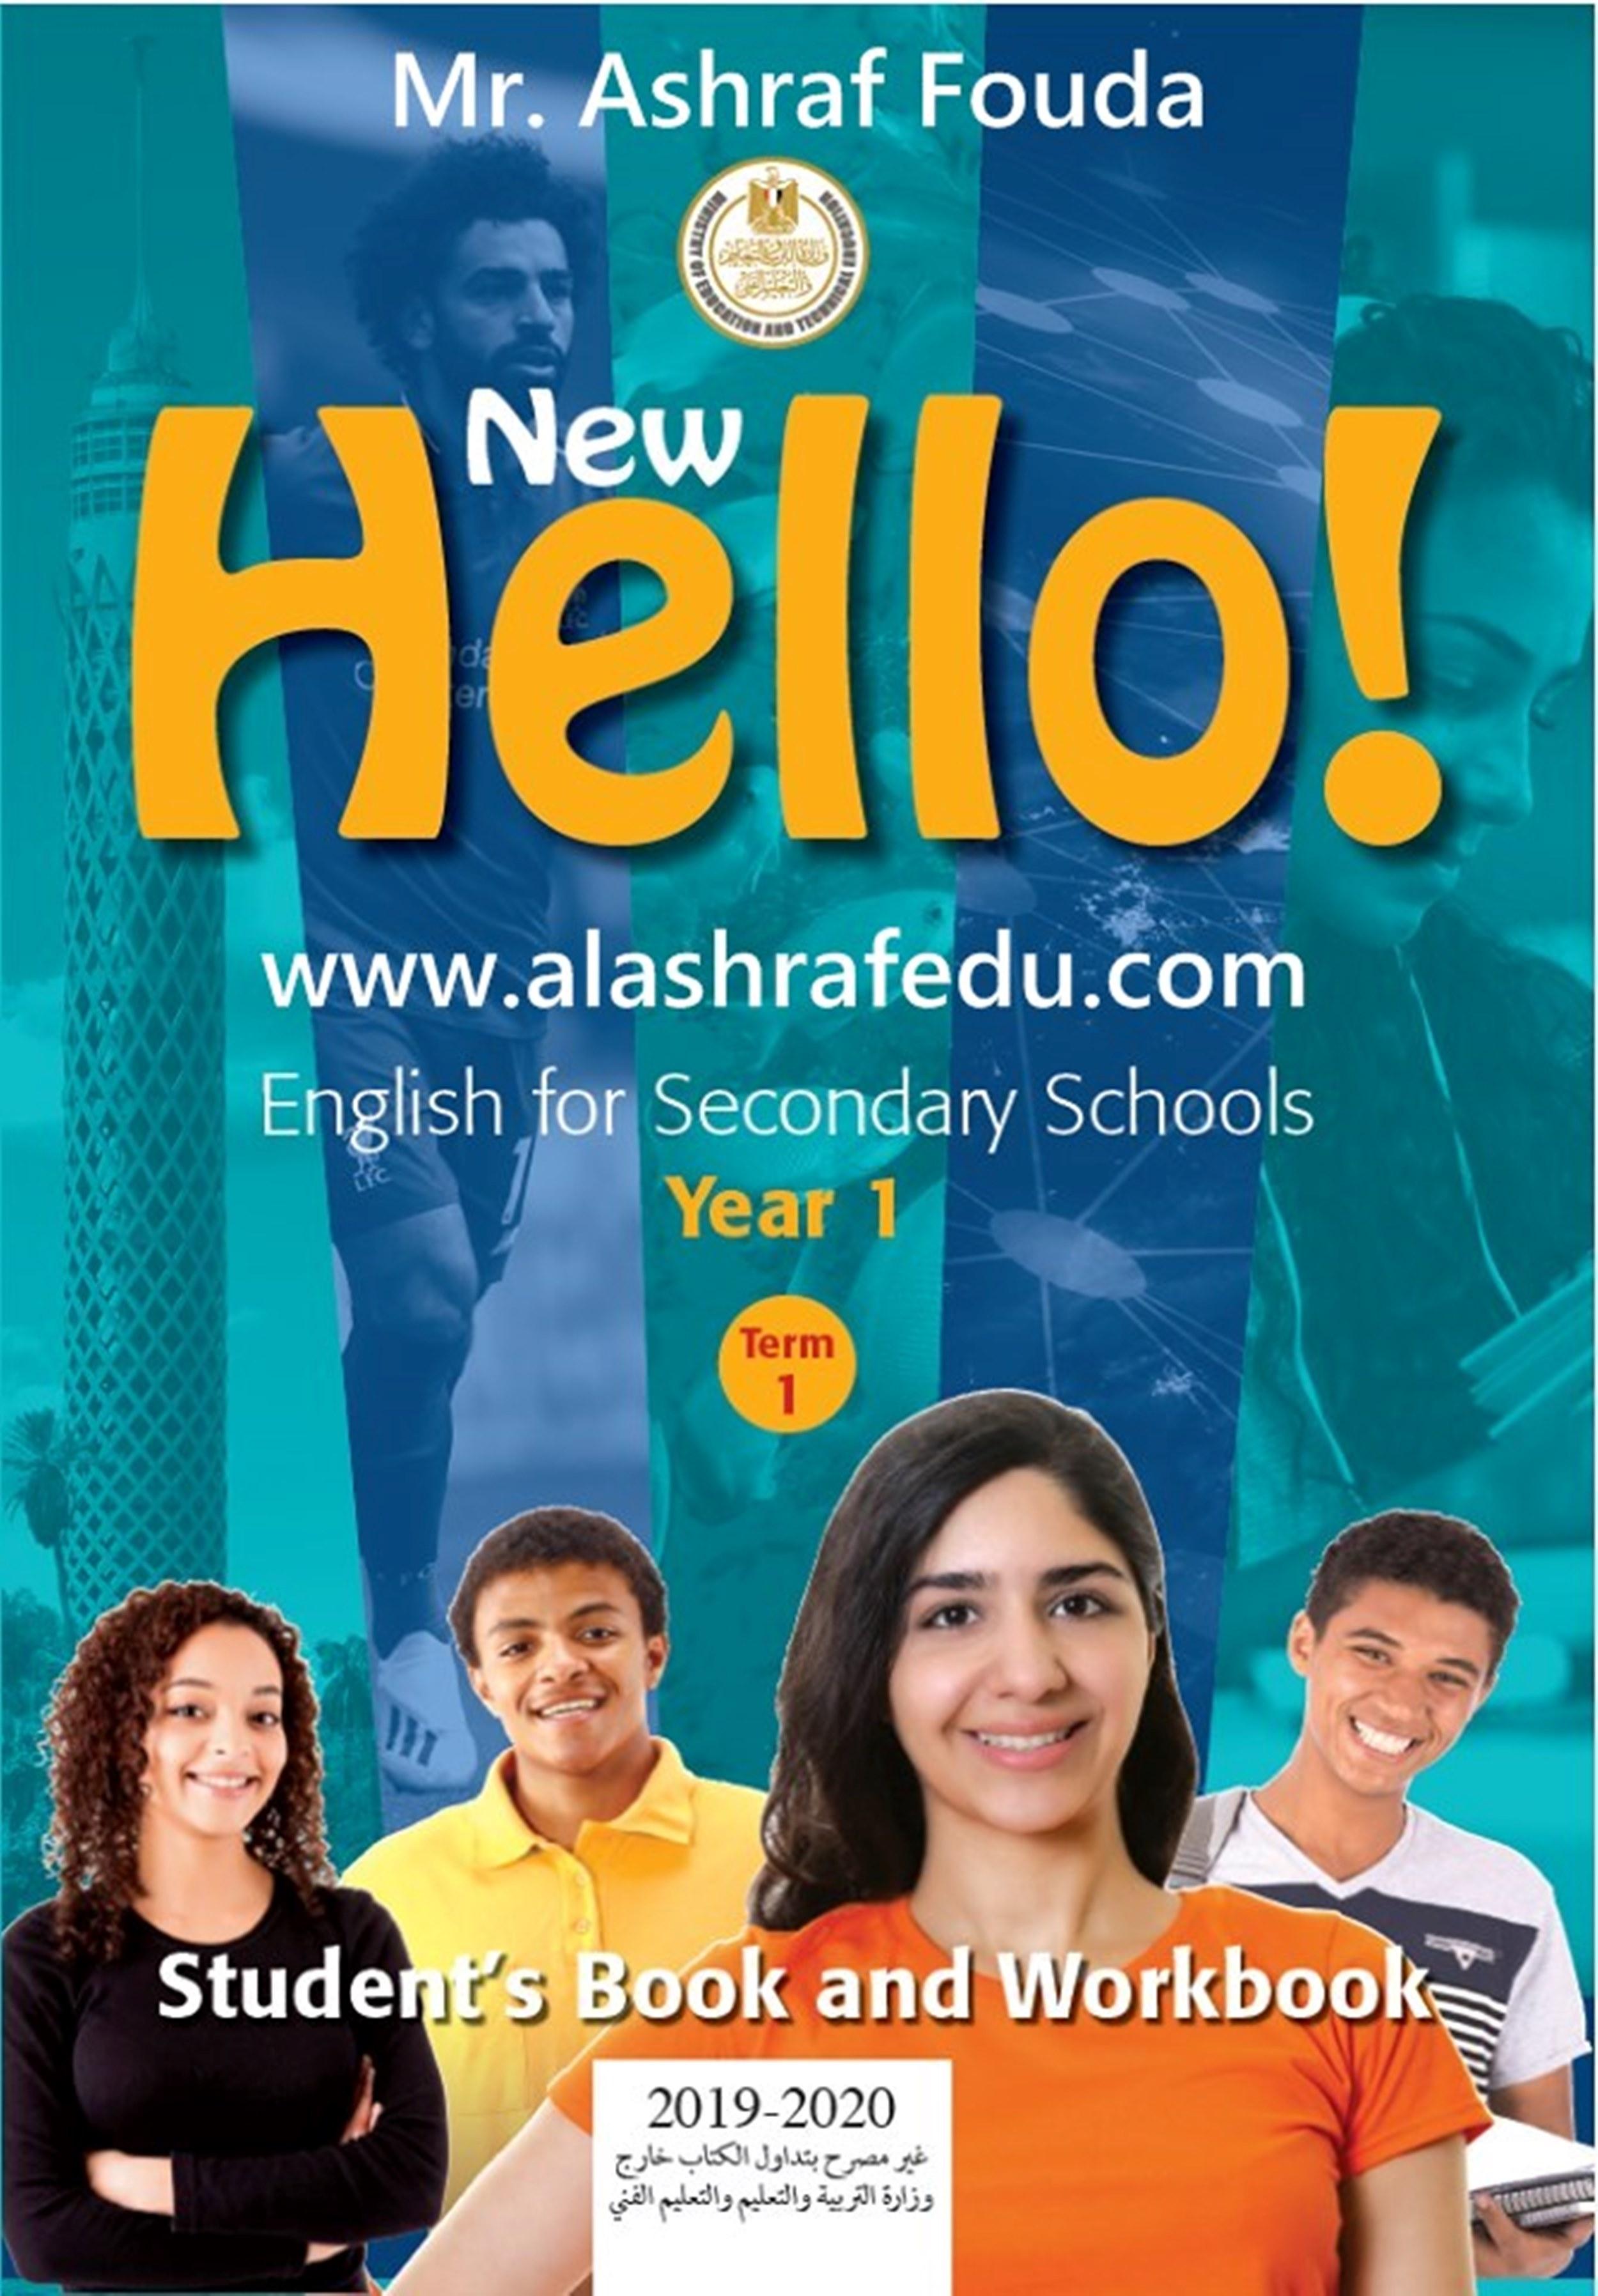 Student's Book Workbook 2020 Secondary First Term www.alashrafedu.com1